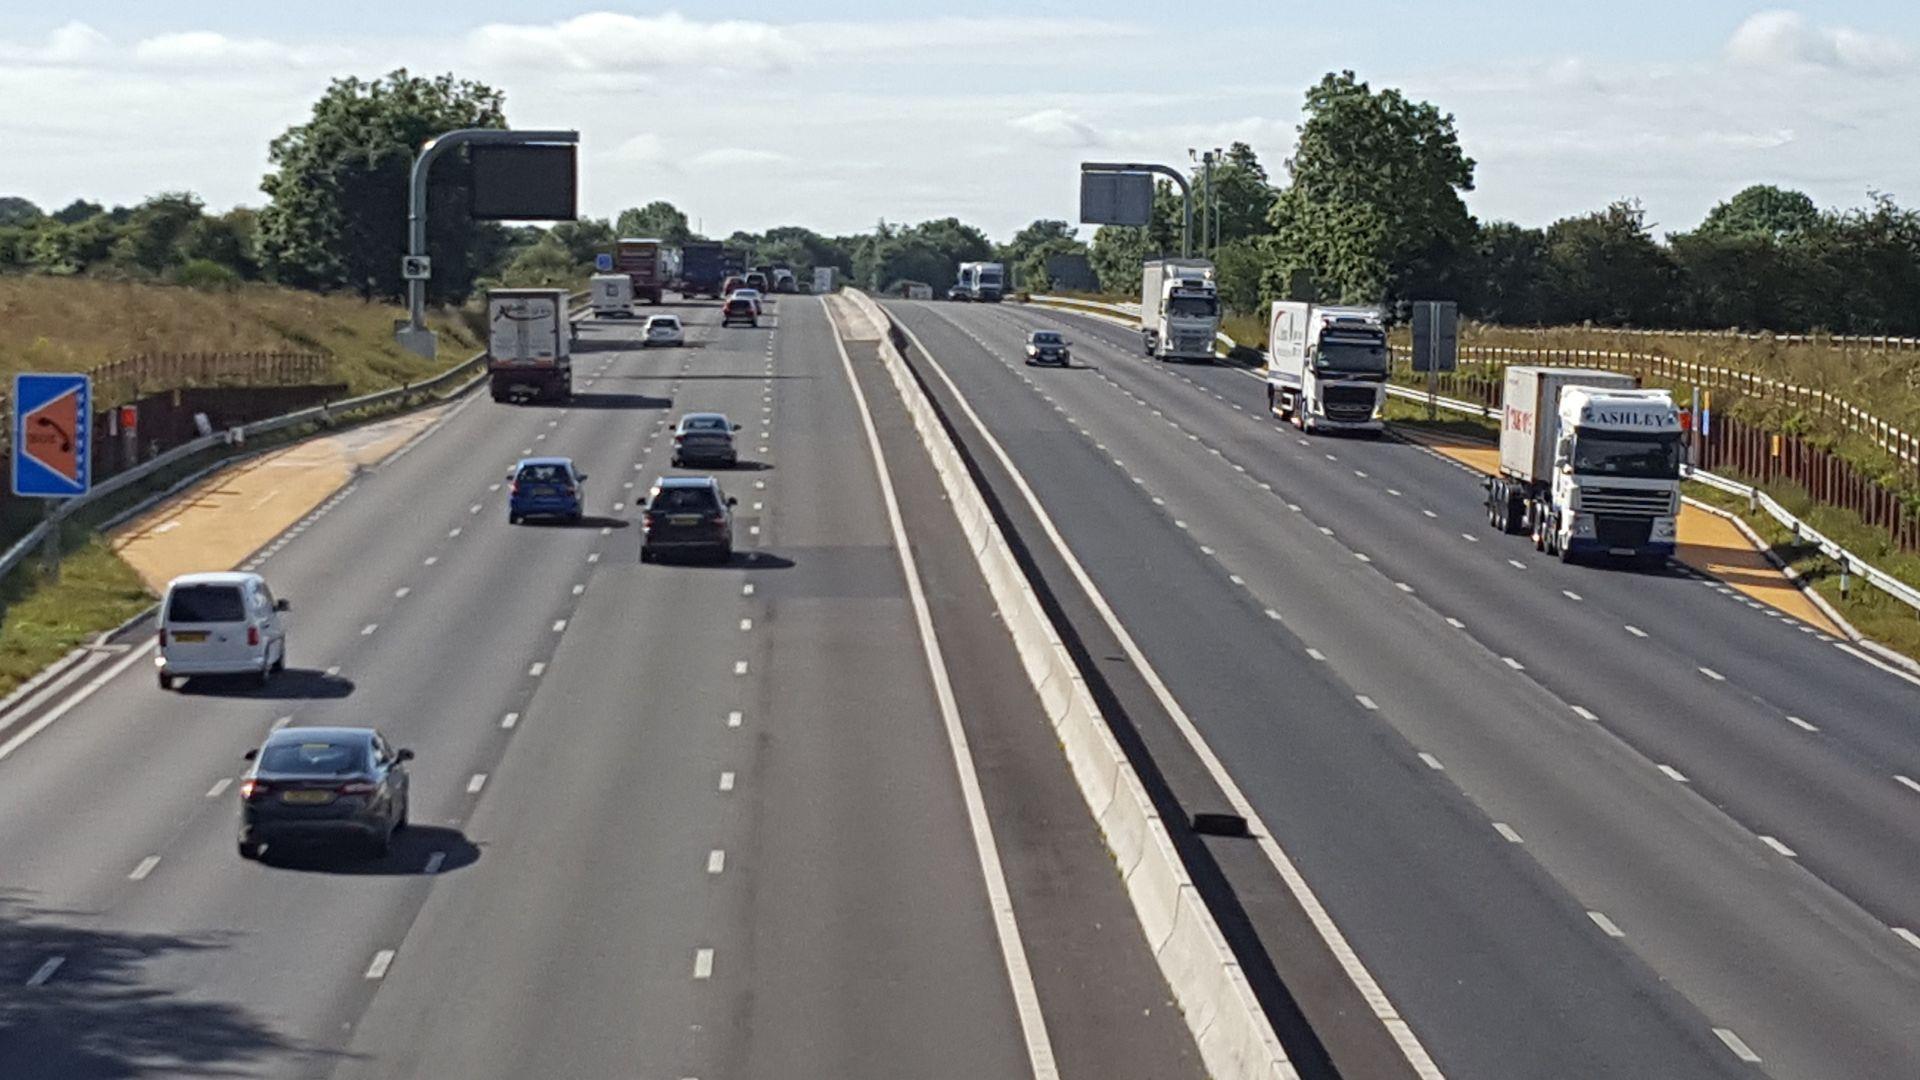 M6 upgrade 30 percent safer says highways england